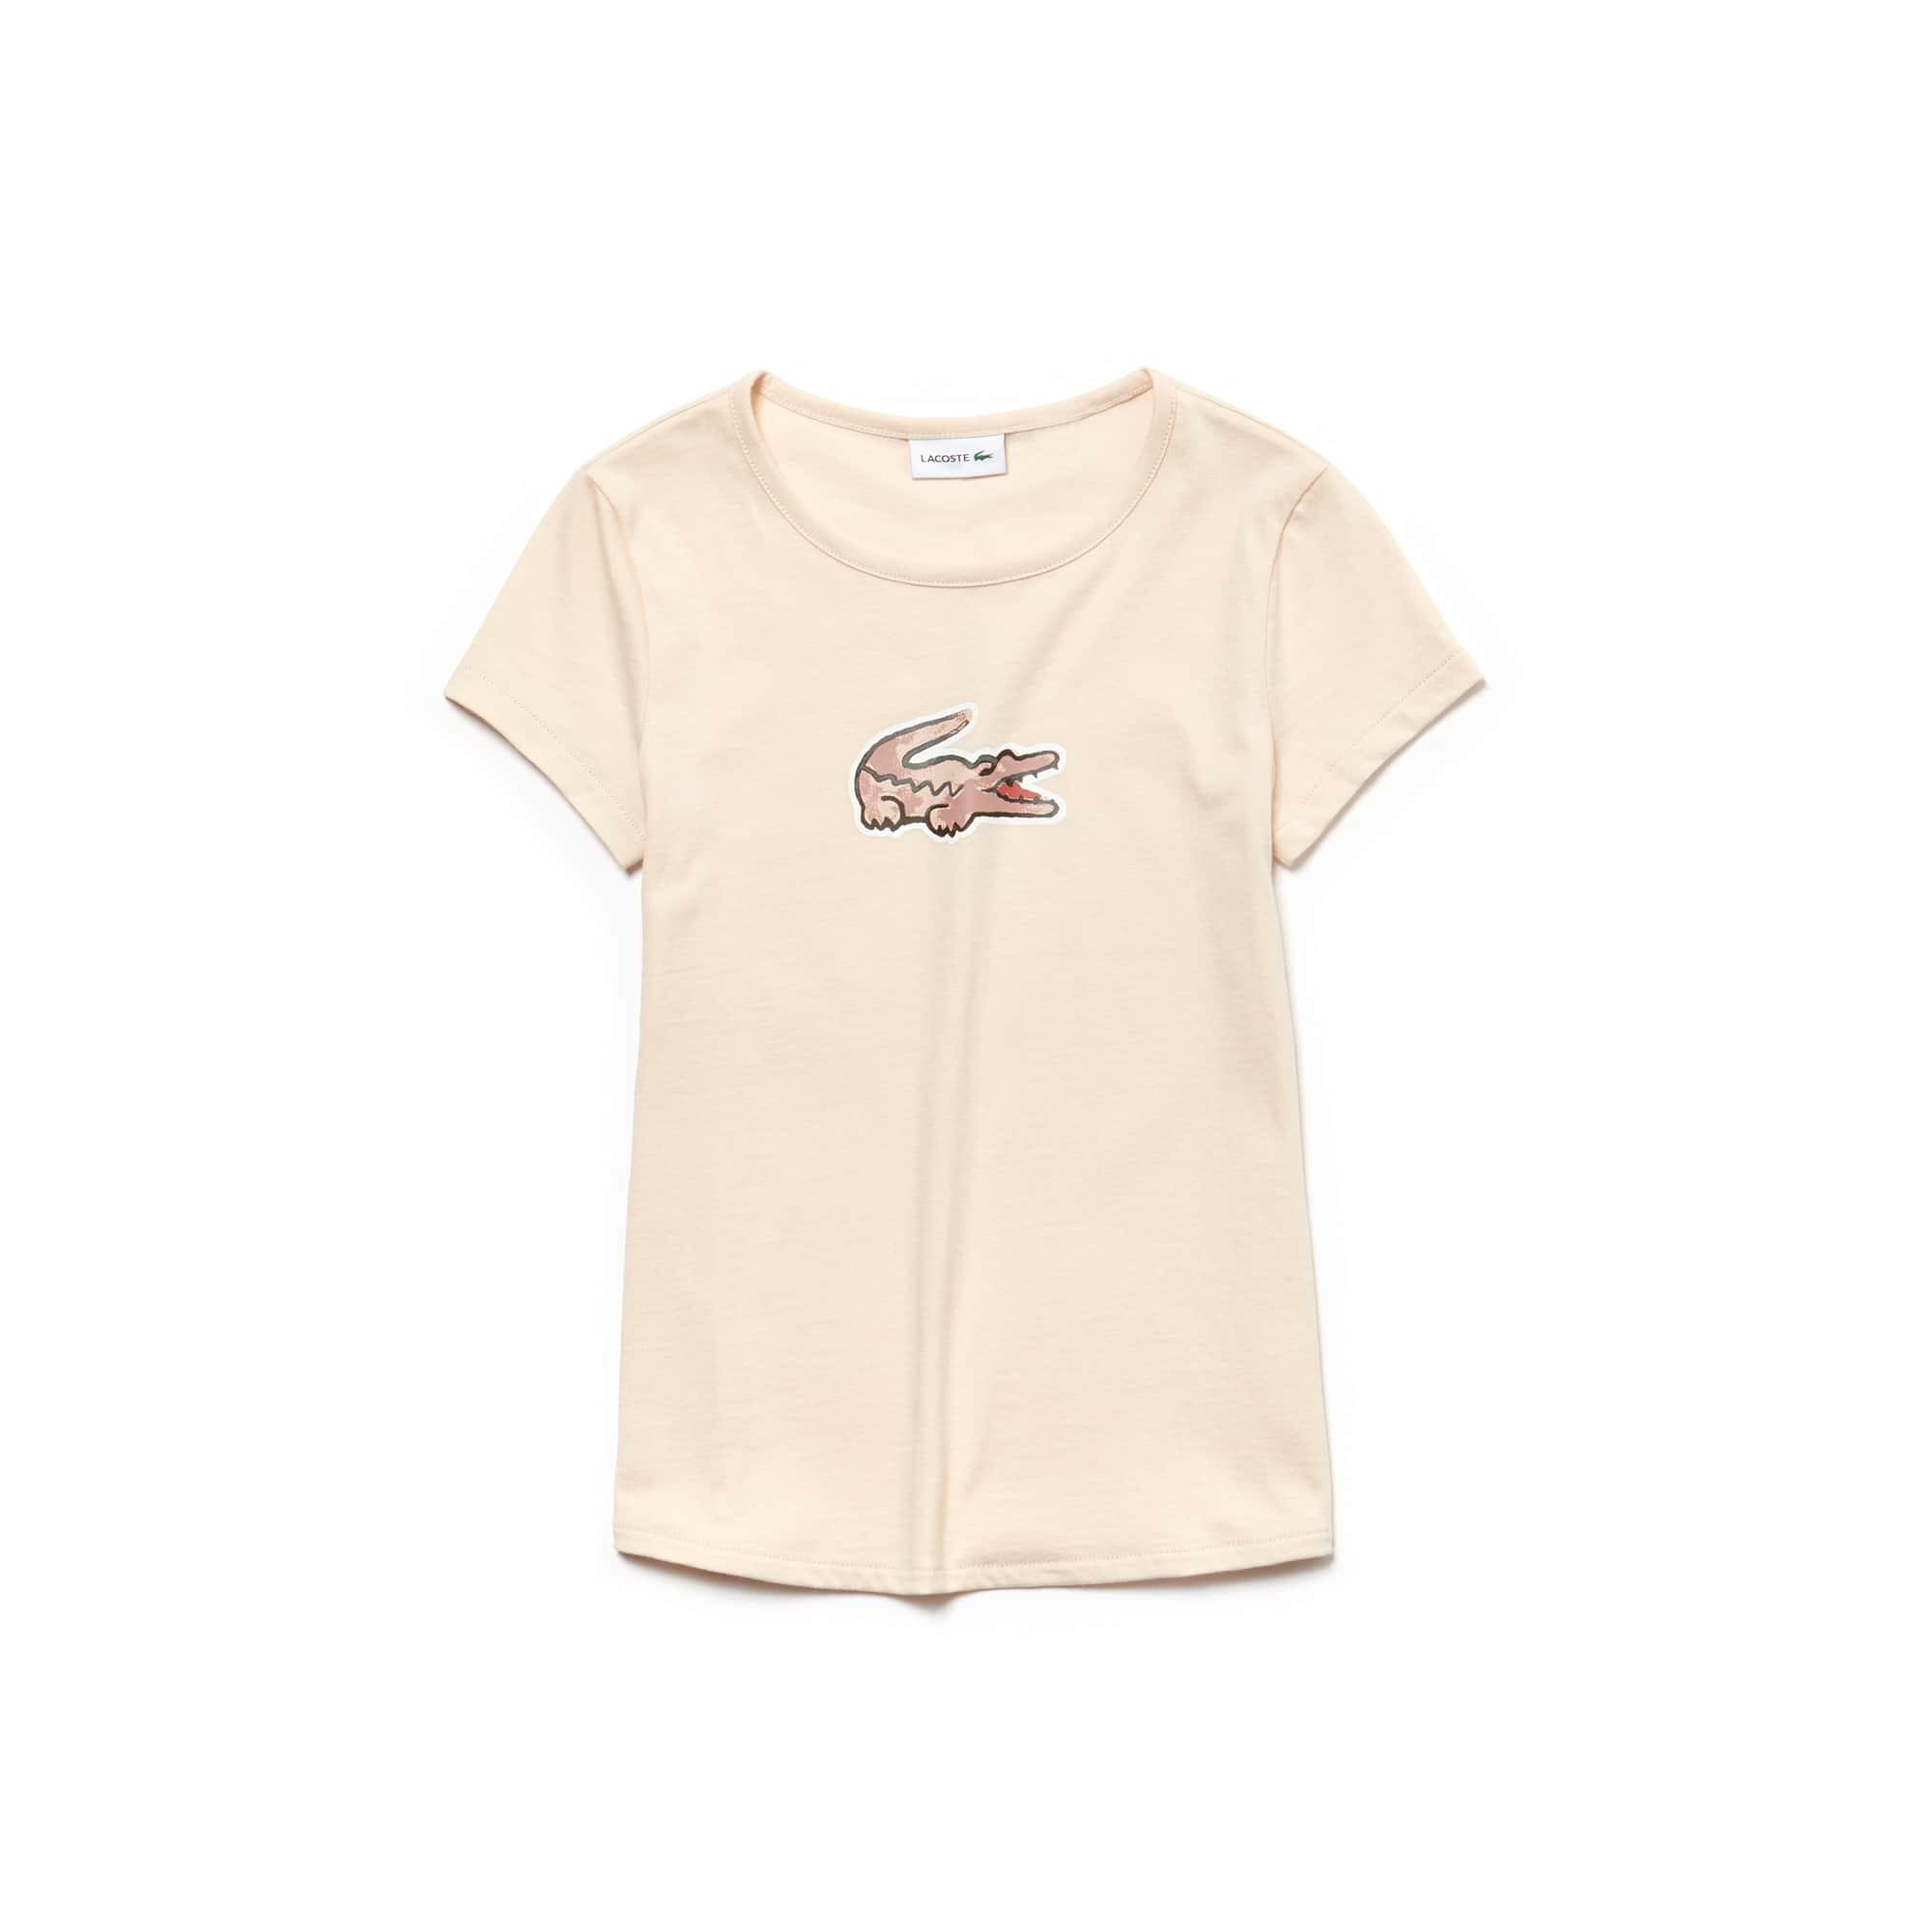 Girls' Crew Neck Crocodile Print Jersey T-shirt